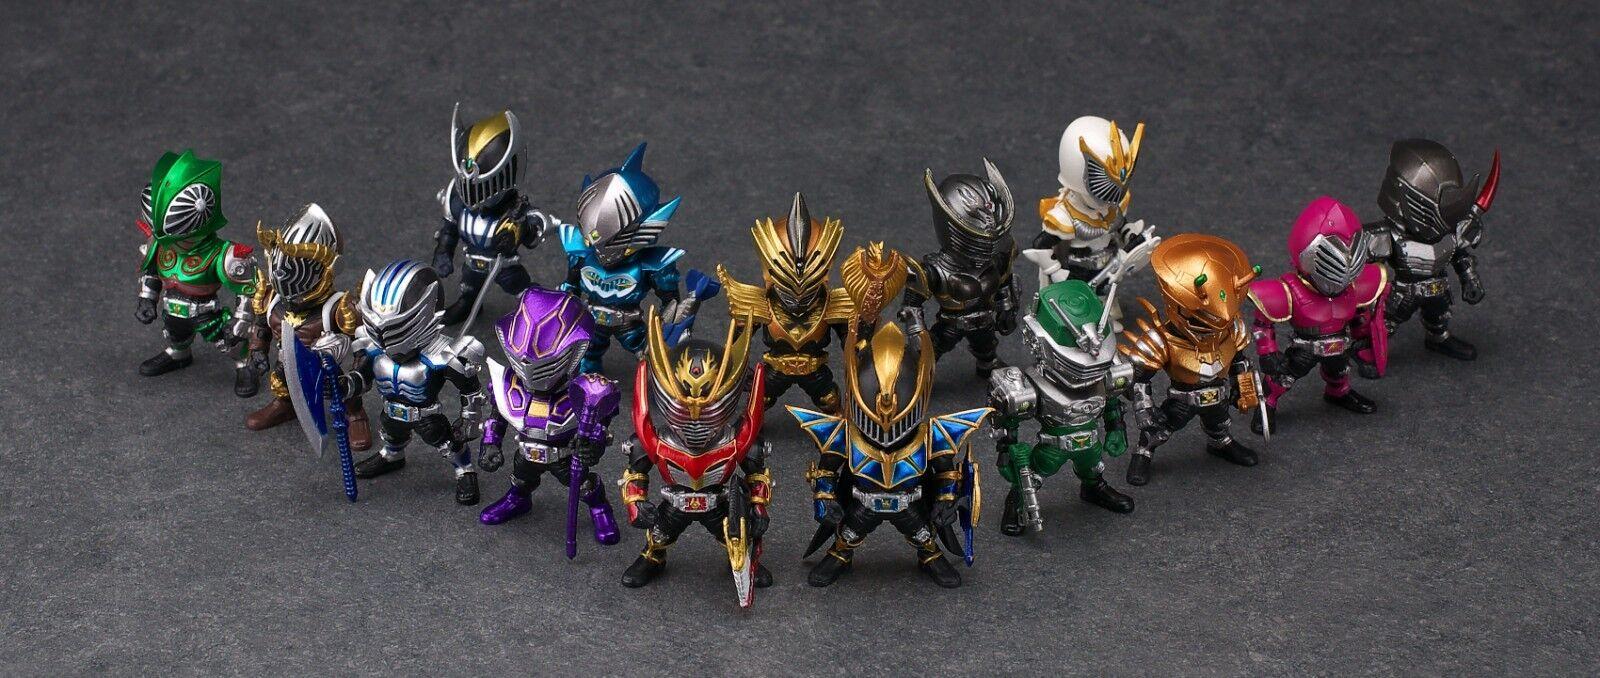 Japan Rare Bandai Converge Kamen Rider PB09 Kamen Rider Ryuki COMPLETE EDITION